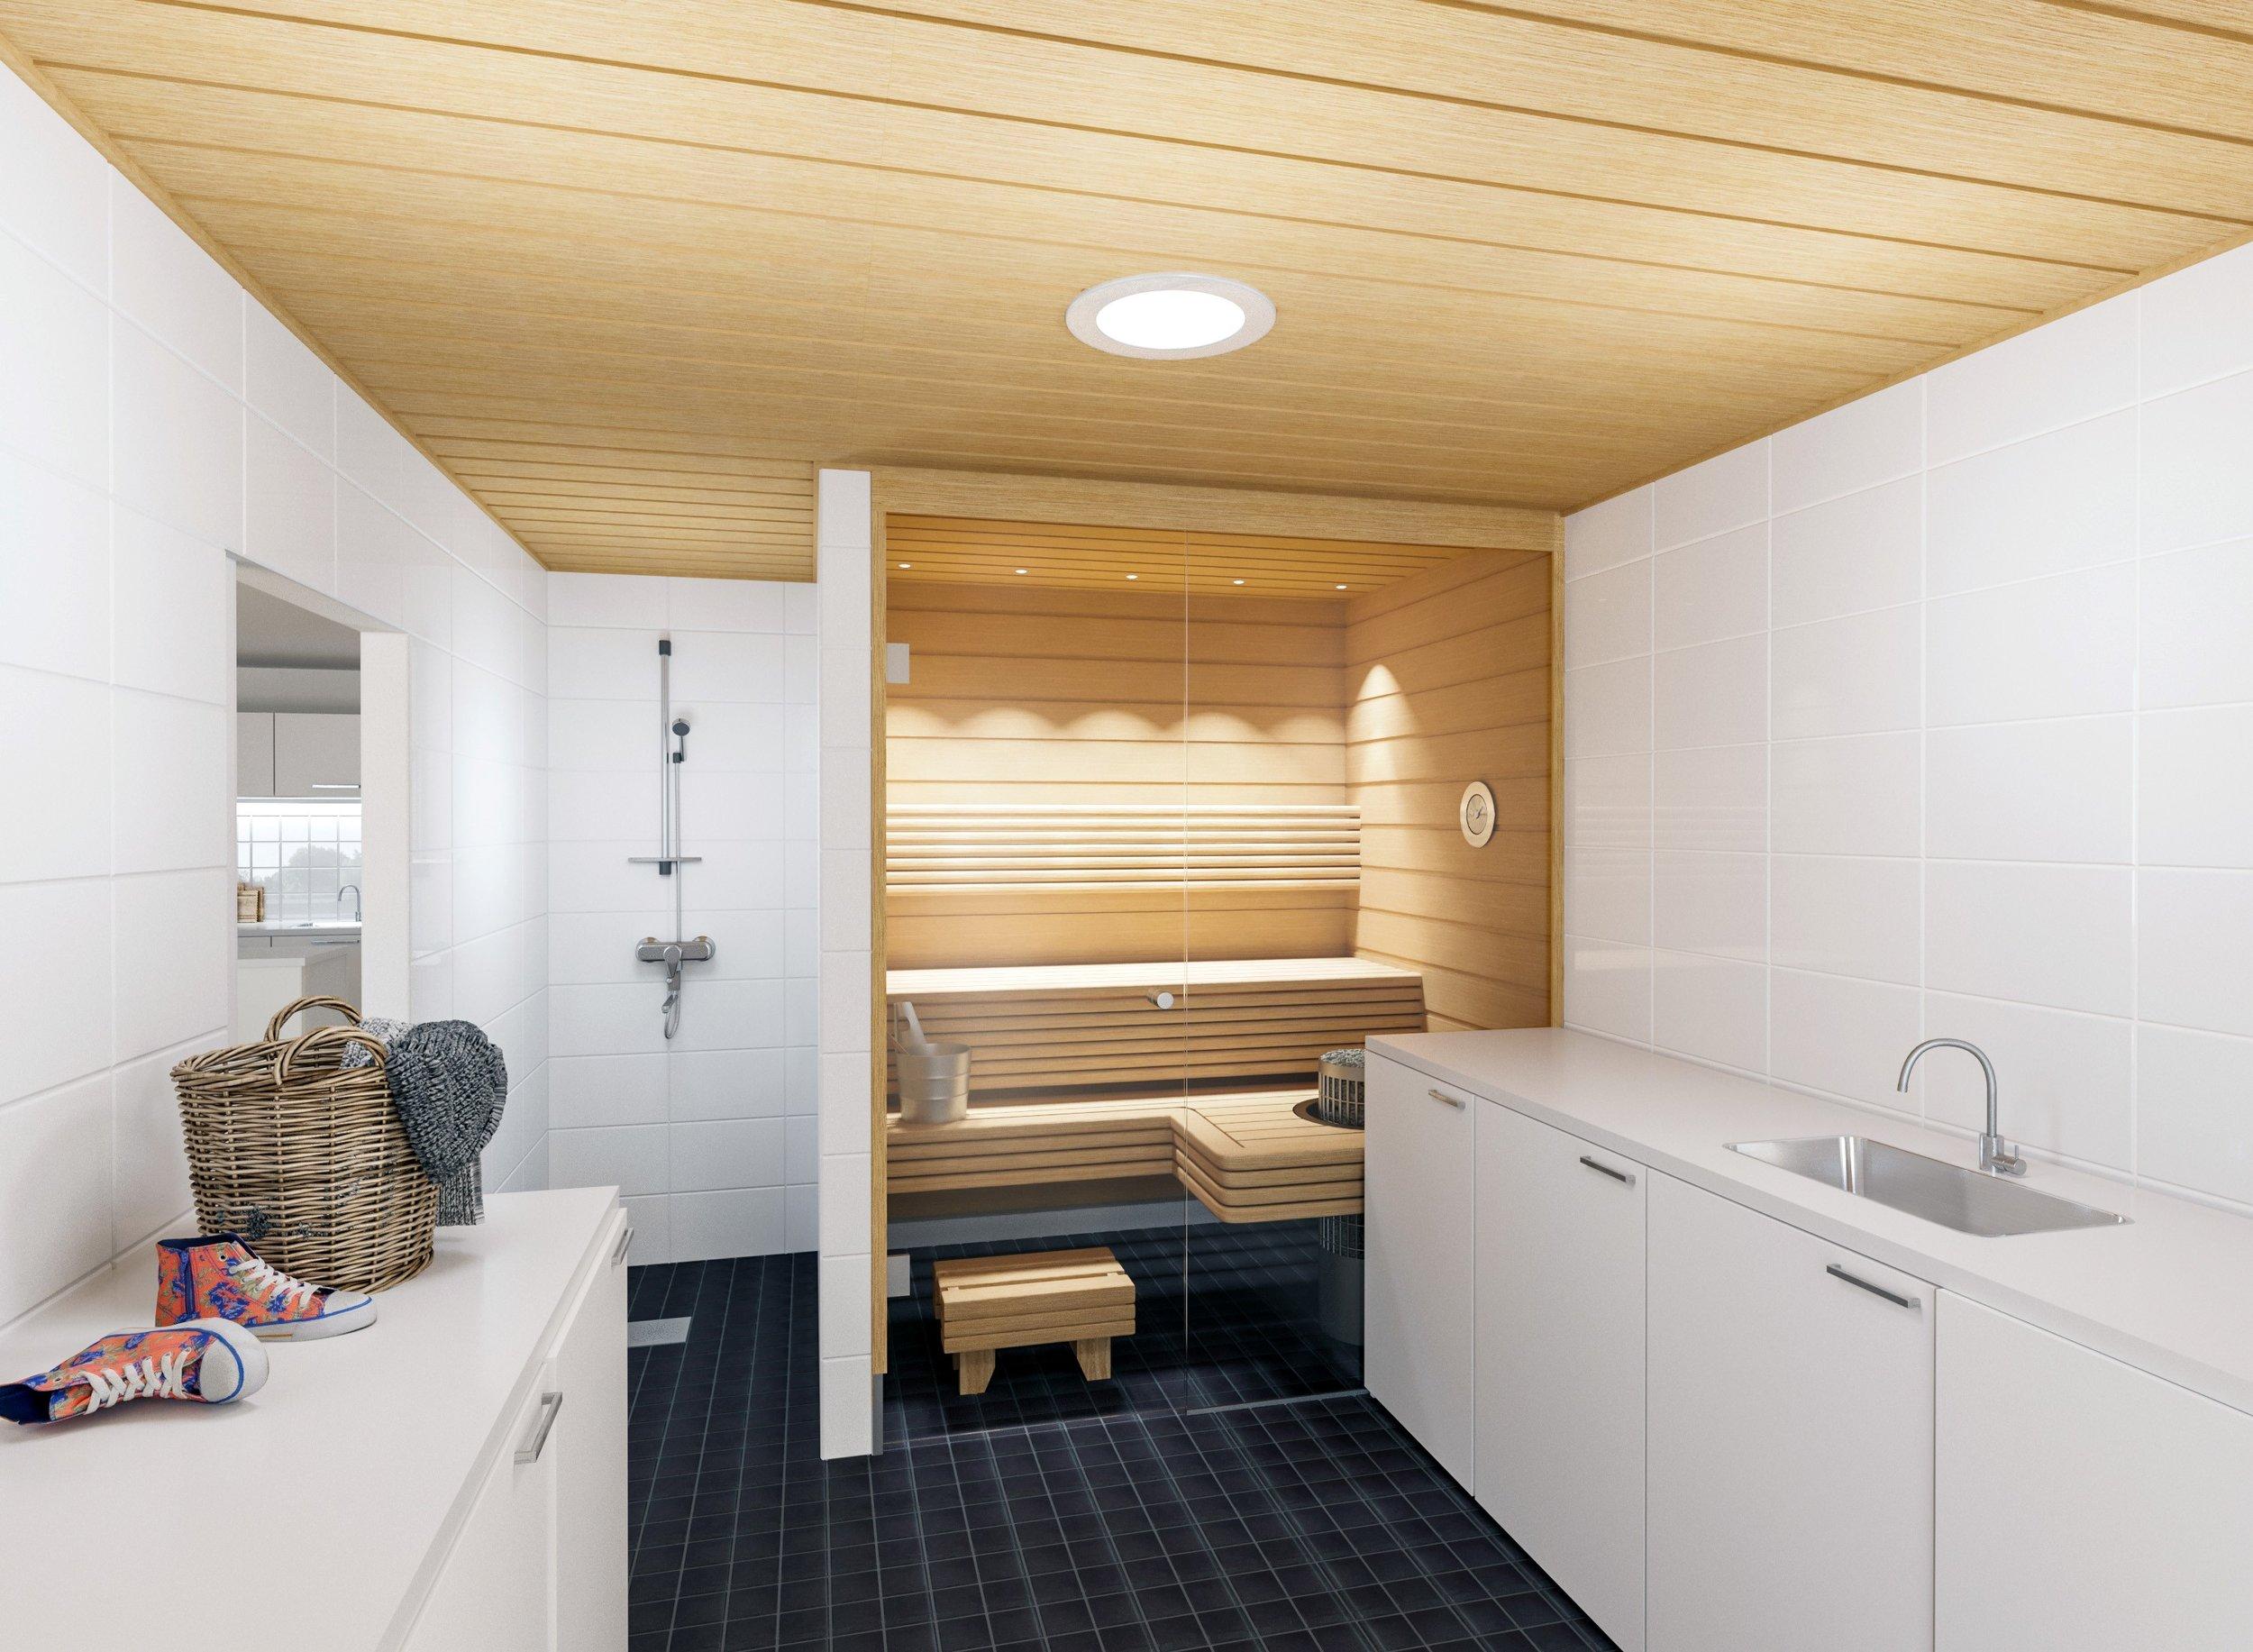 Kylpyhuone ja sauna 103 m2